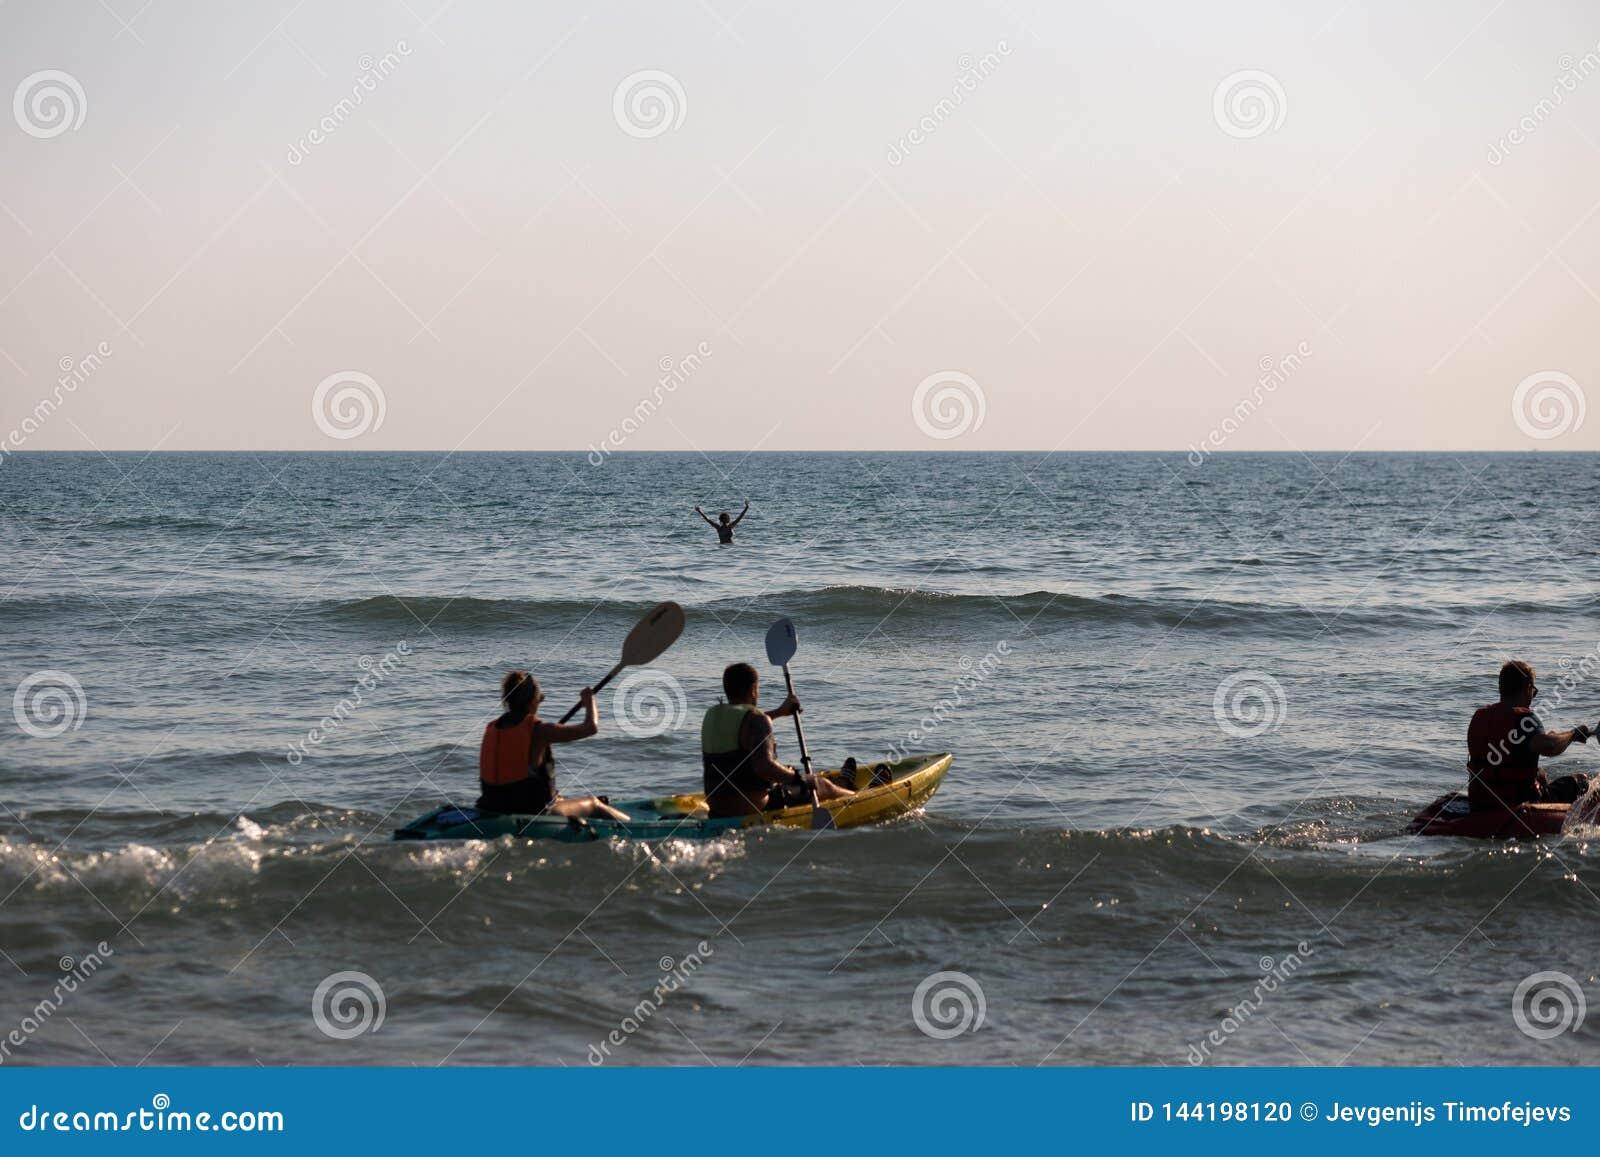 KO CHANG, ΤΑΪΛΆΝΔΗ - 9 ΑΠΡΙΛΊΟΥ 2018: Άτομα ανθρώπων που σε μια βάρκα καγιάκ - όμορφη τροπική παραλία παραδείσου